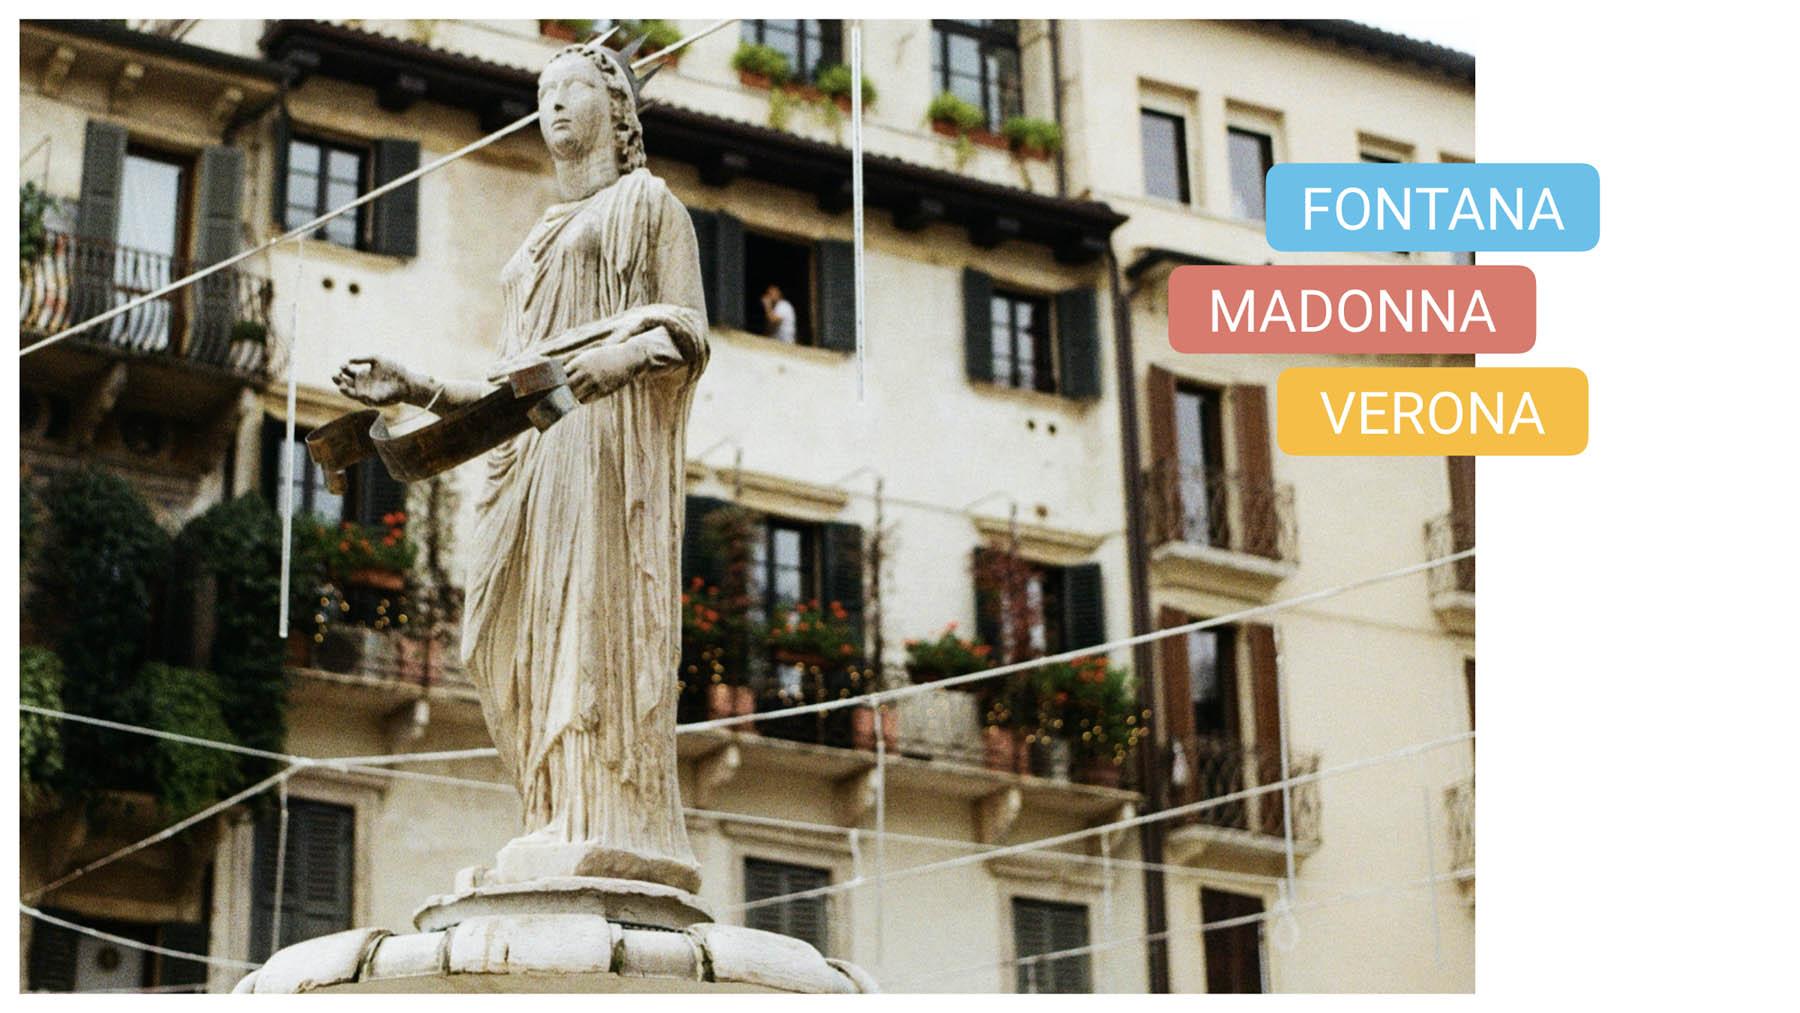 piazza erbe bike tour verona fontana madonna